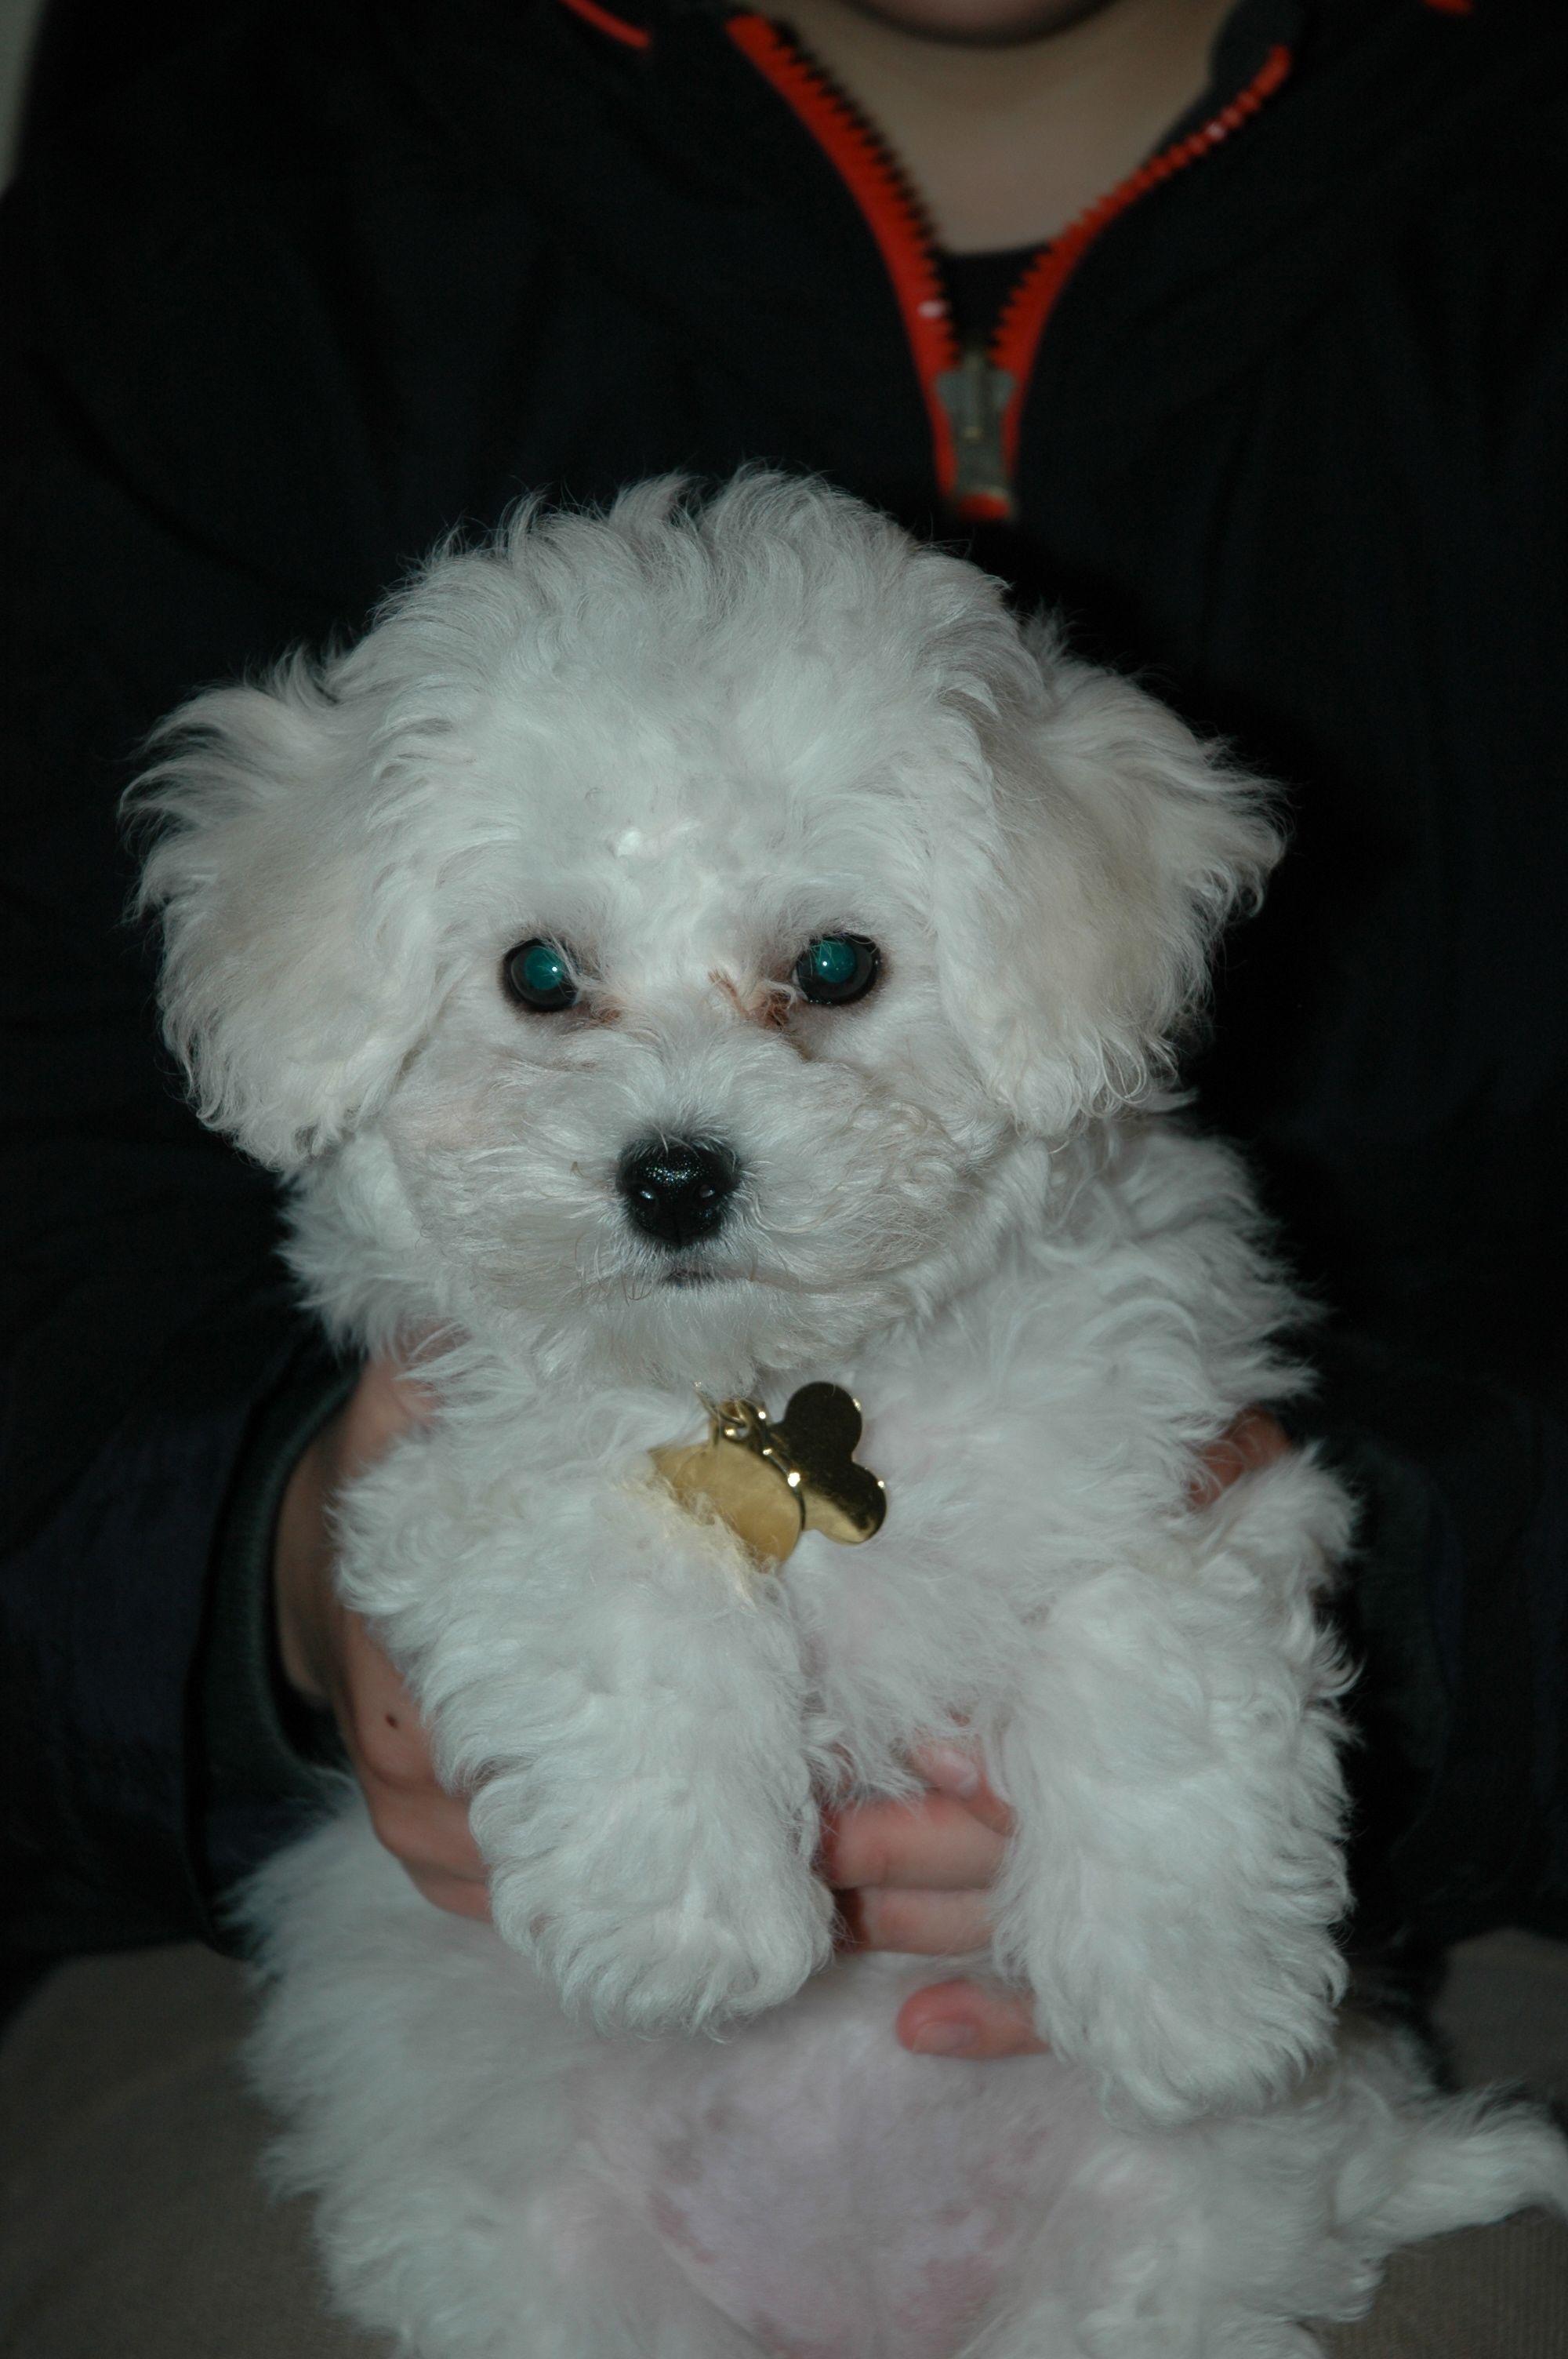 Bichon Puppy Like One Of Mine 3 Bichon Dog Cute Animals